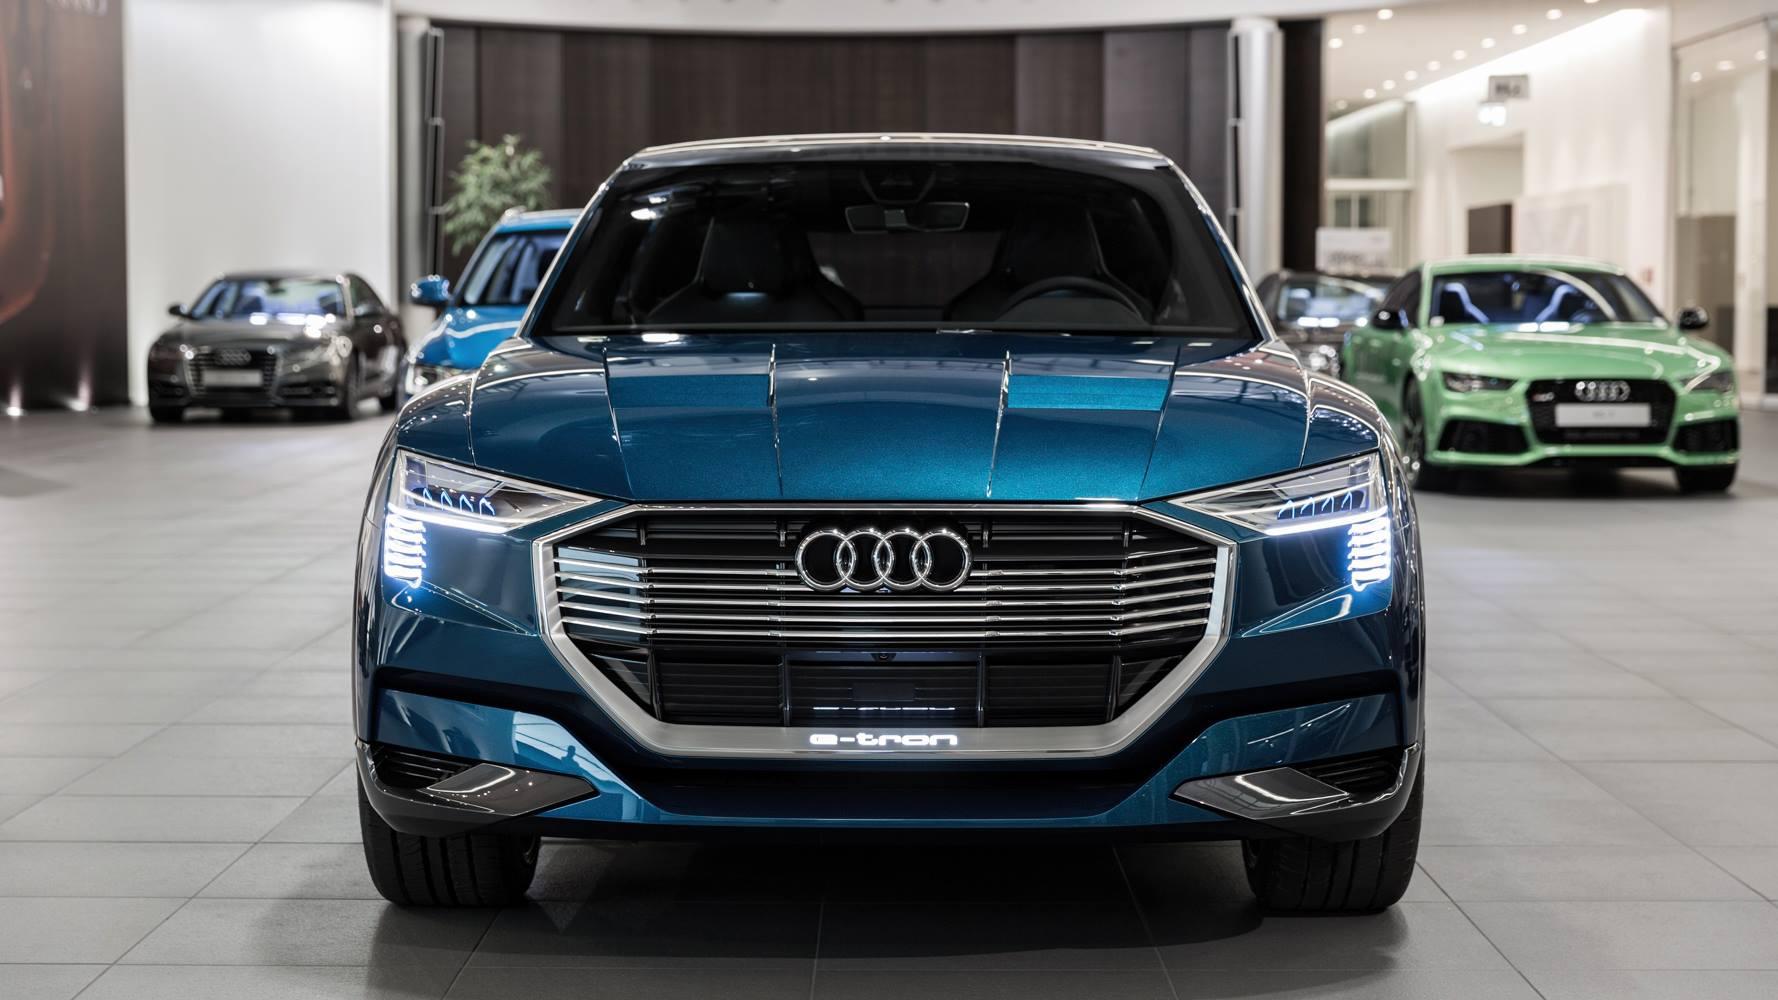 Audi Q6 E Tron >> Reservations Open In Norway For The 2018 Audi e-tron Electric SUV - autoevolution